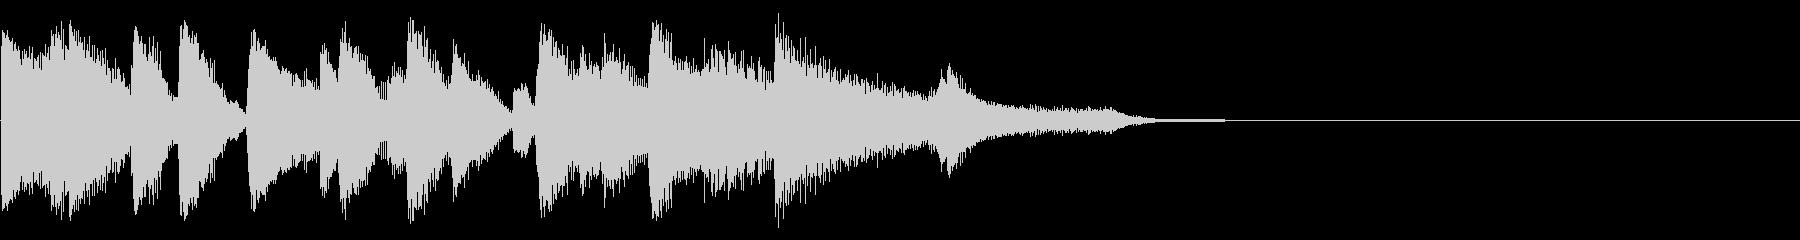 CM前などに ピアノジングル約8秒の未再生の波形